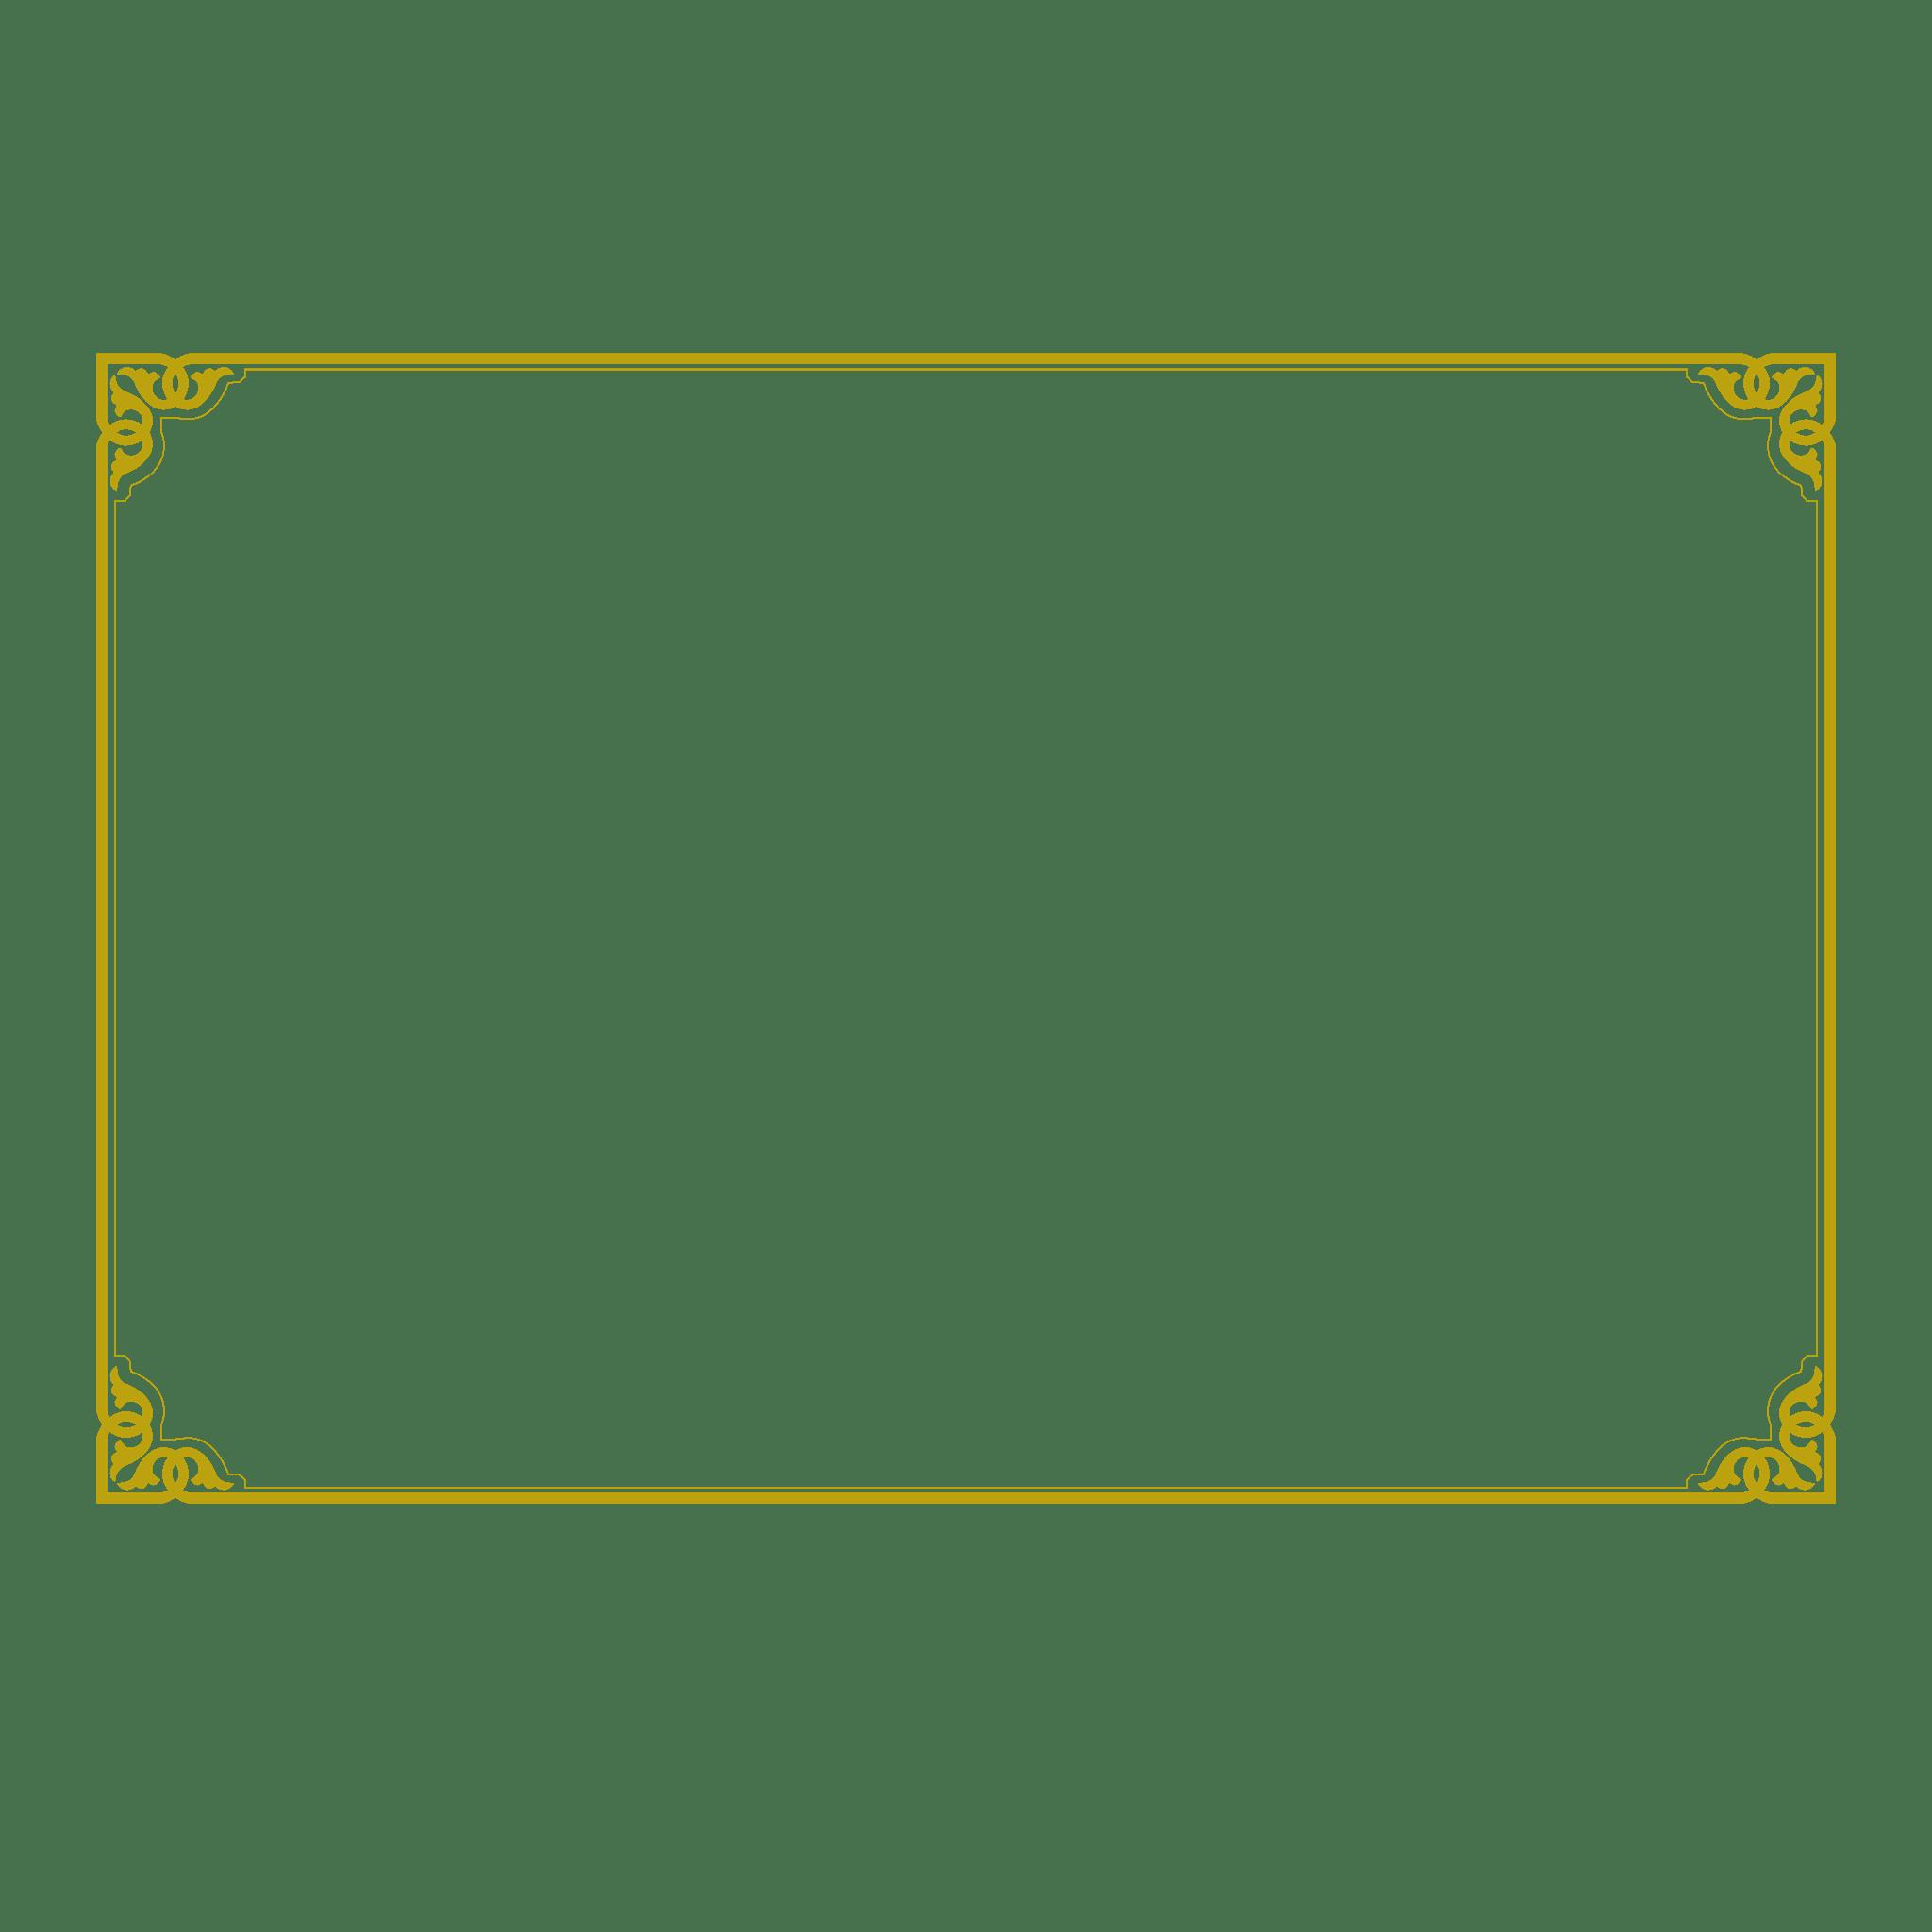 Rectangle Gold Golden Deco Border Transparent Png Clip Art Unlimited Download Kisspng Com Bingkai Desain Logo Desain